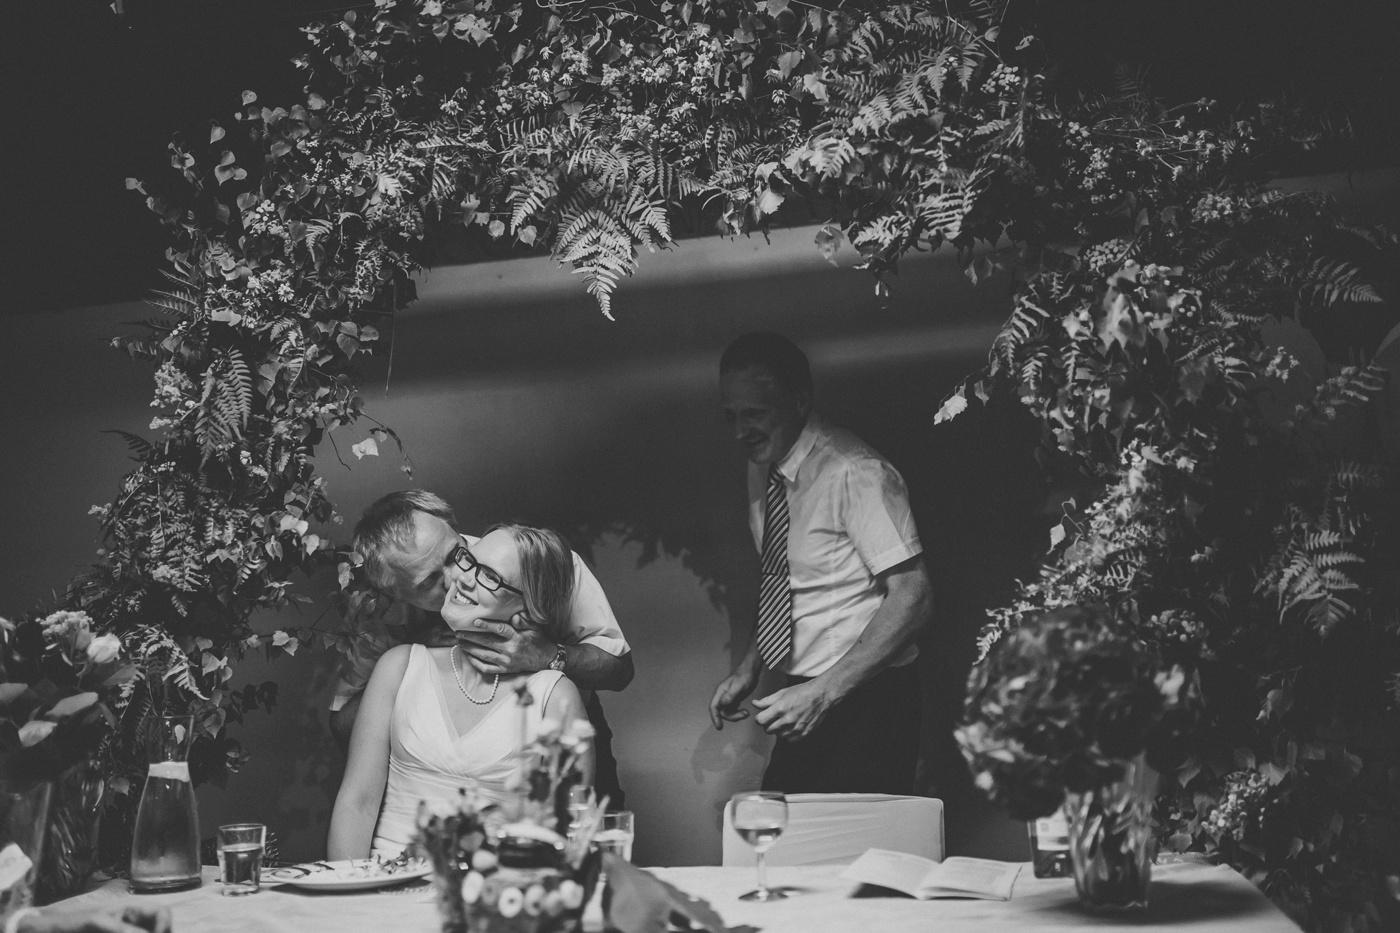 ceciliajoakim_sweden-countryside-summer-wedding_melbourne-fun-quirky-wedding-photography_72